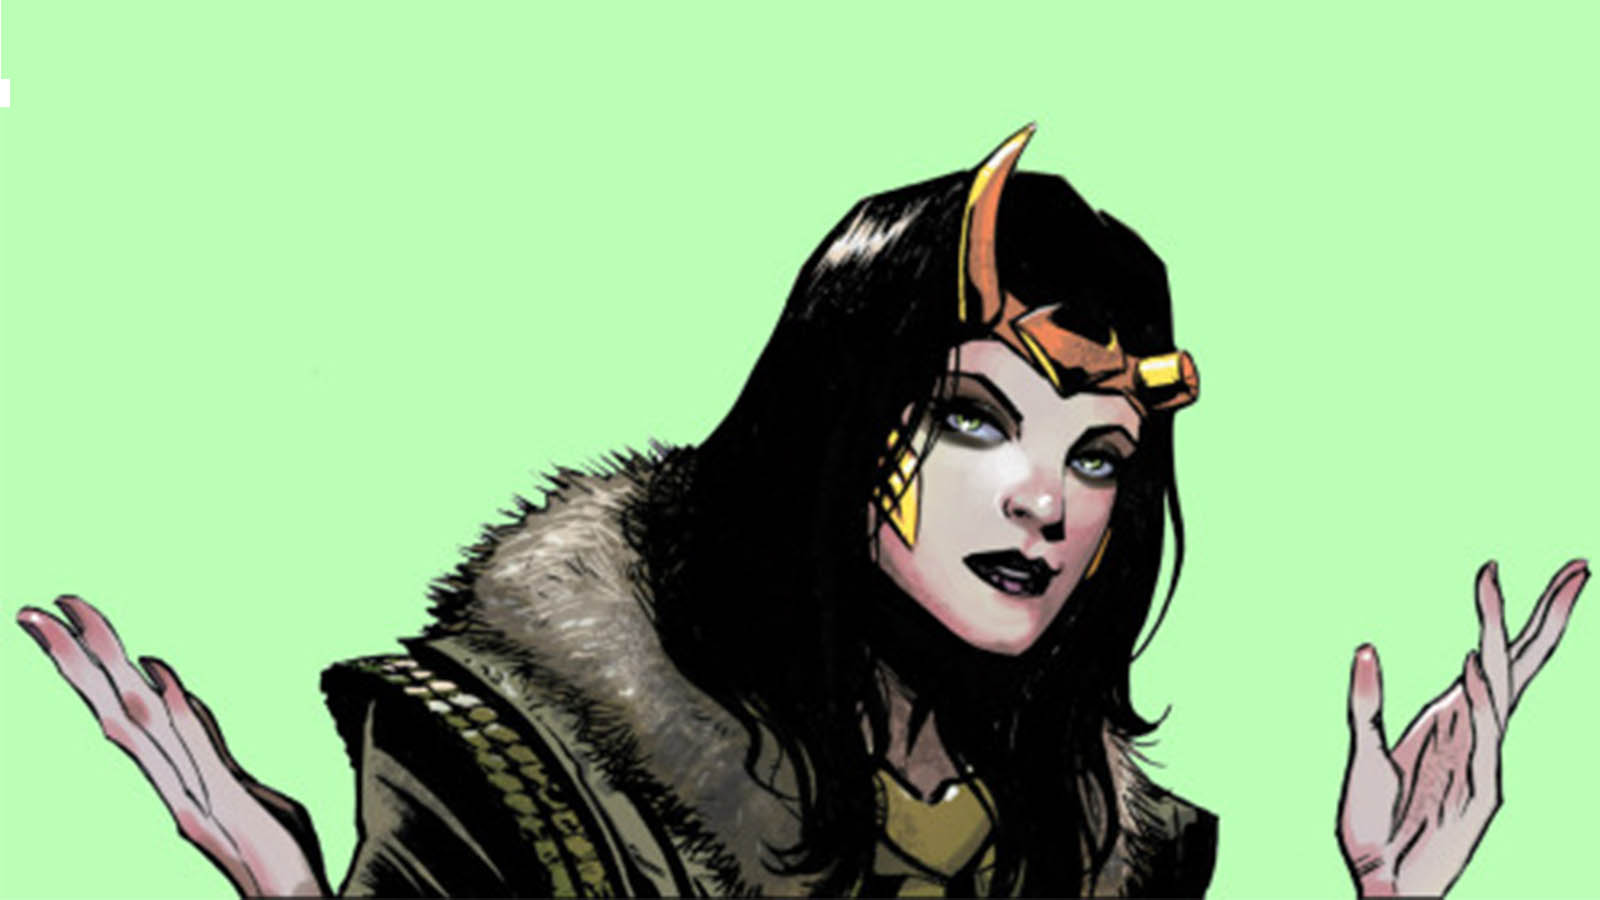 Disney+ May Introduce A Female Version of Loki in Tom Hiddleston Series - Dankanator